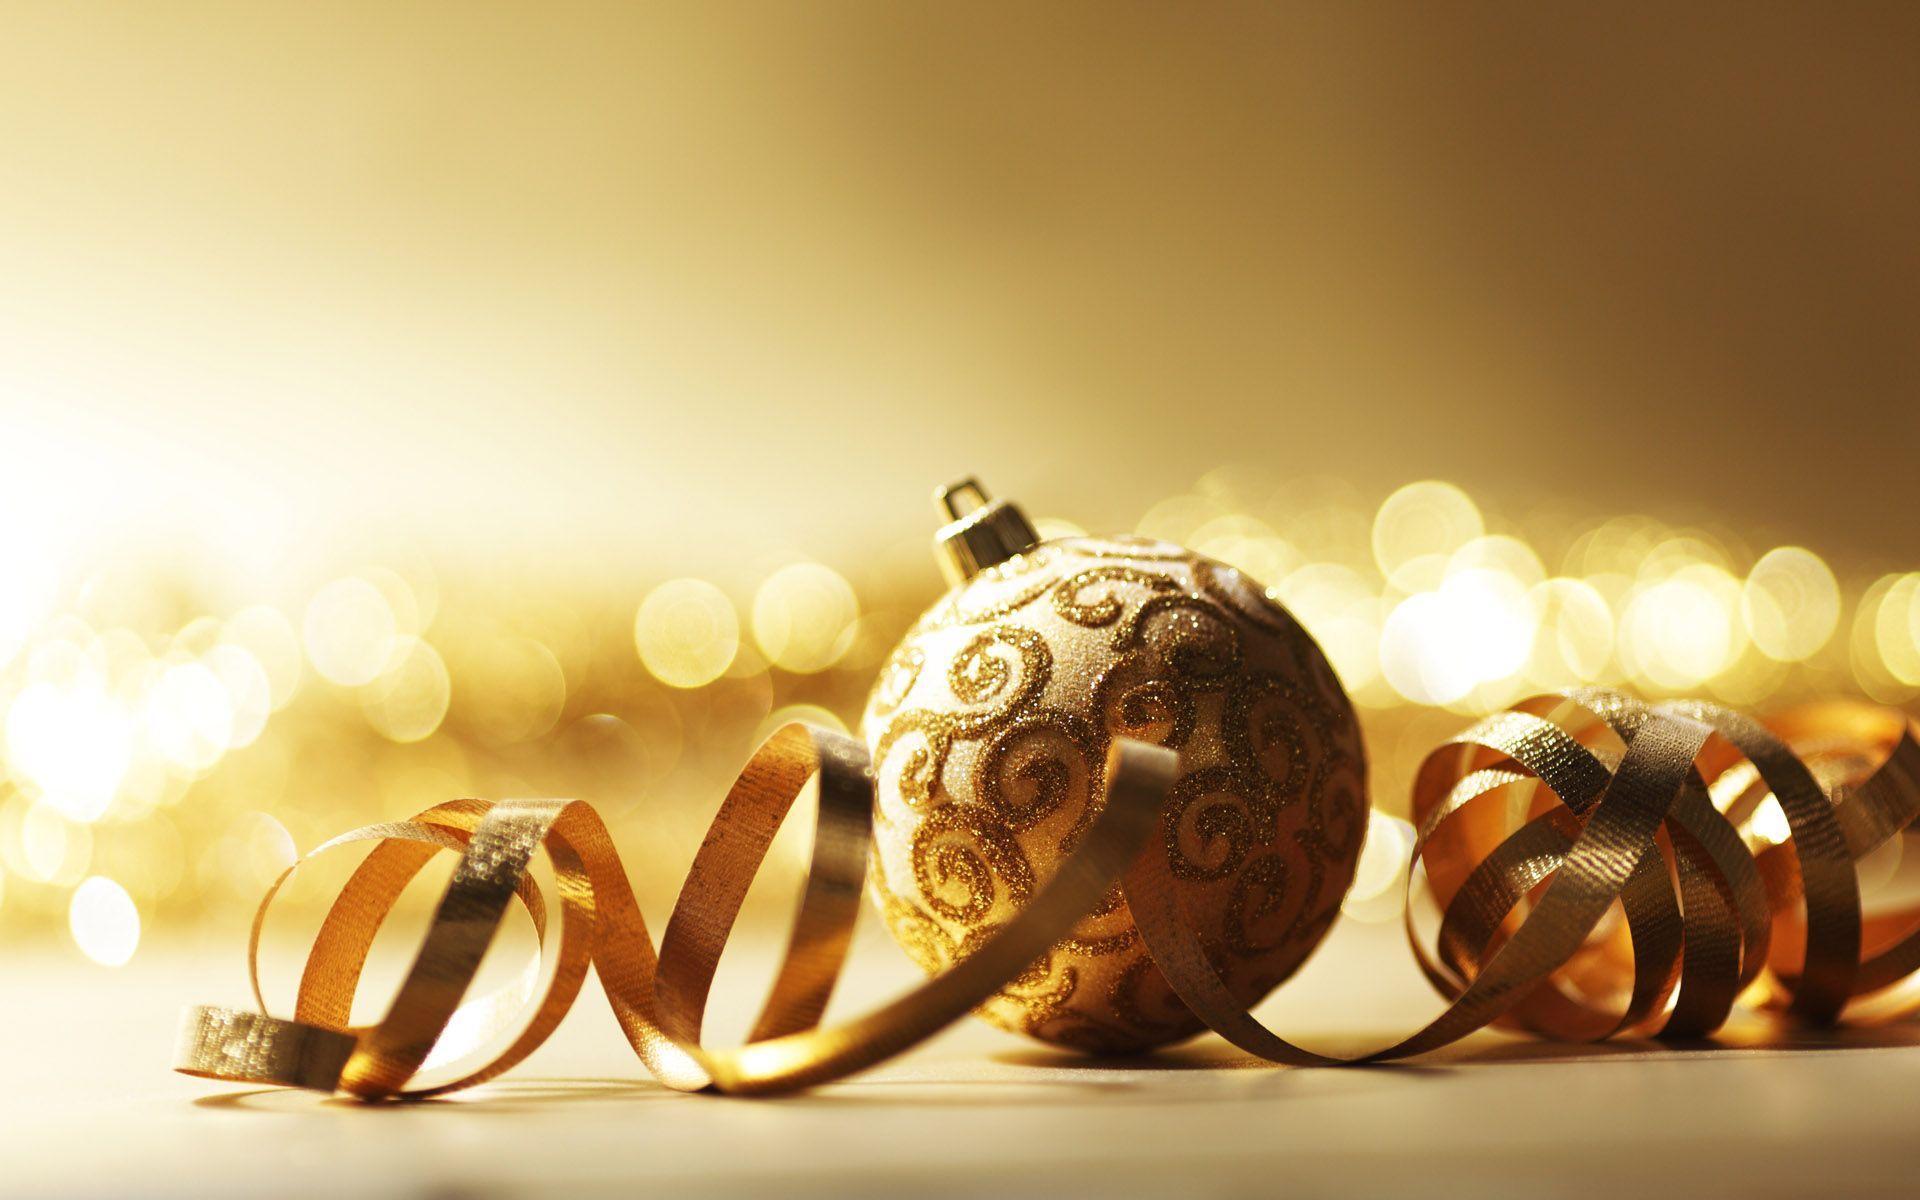 Xmas Stuff For > Gold Christmas Ornaments Wallpaper